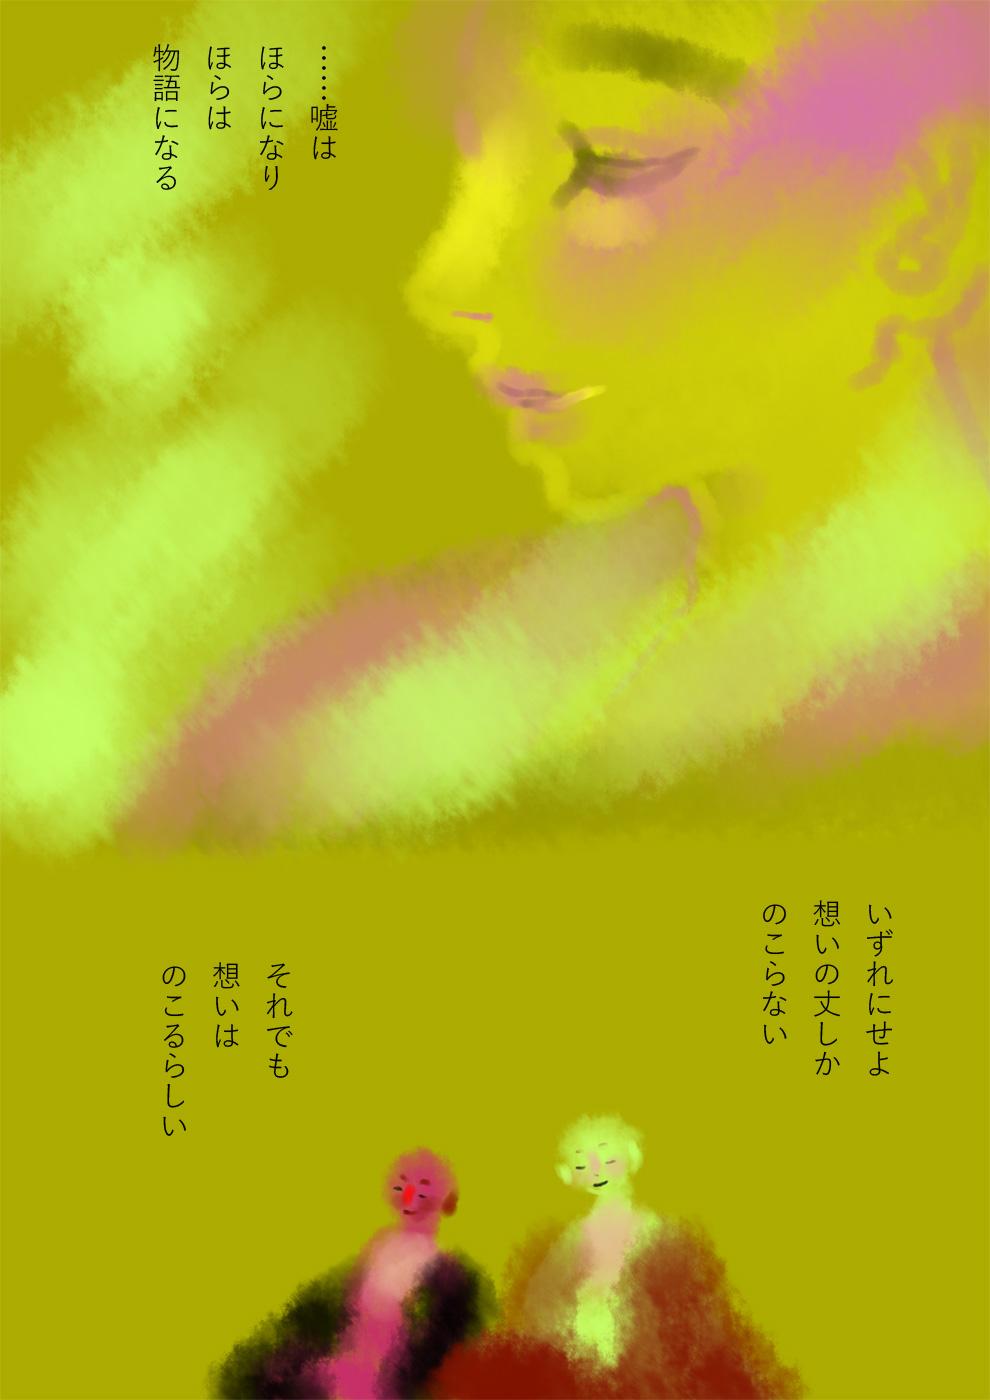 http://ahito.com/comic/ehon/voice/img/2018/20180323/03.jpg